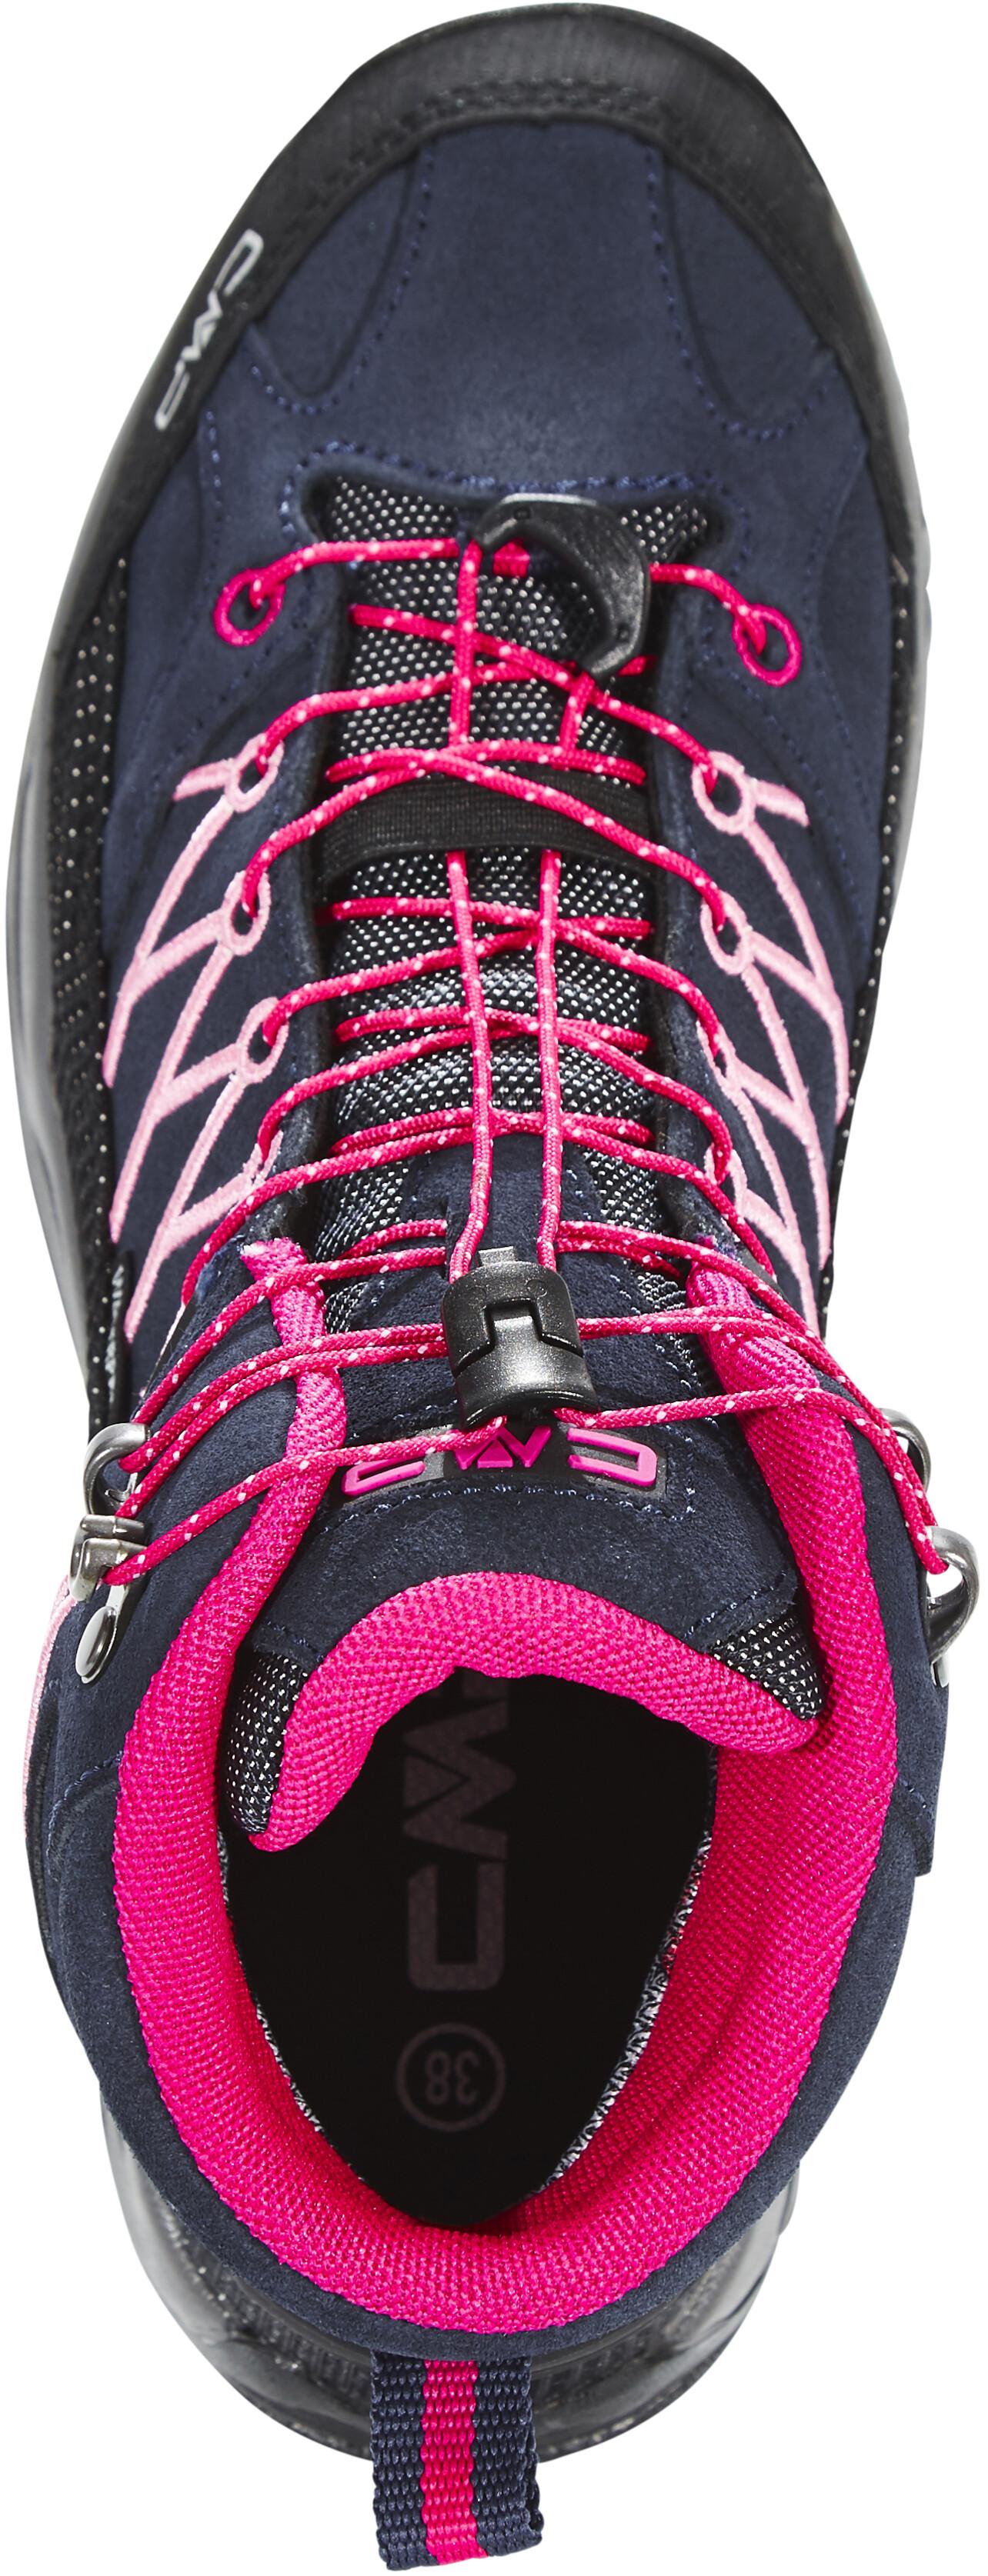 4782c4db151f18 CMP Campagnolo Rigel Mid WP Schoenen Kinderen roze/blauw l Outdoor ...